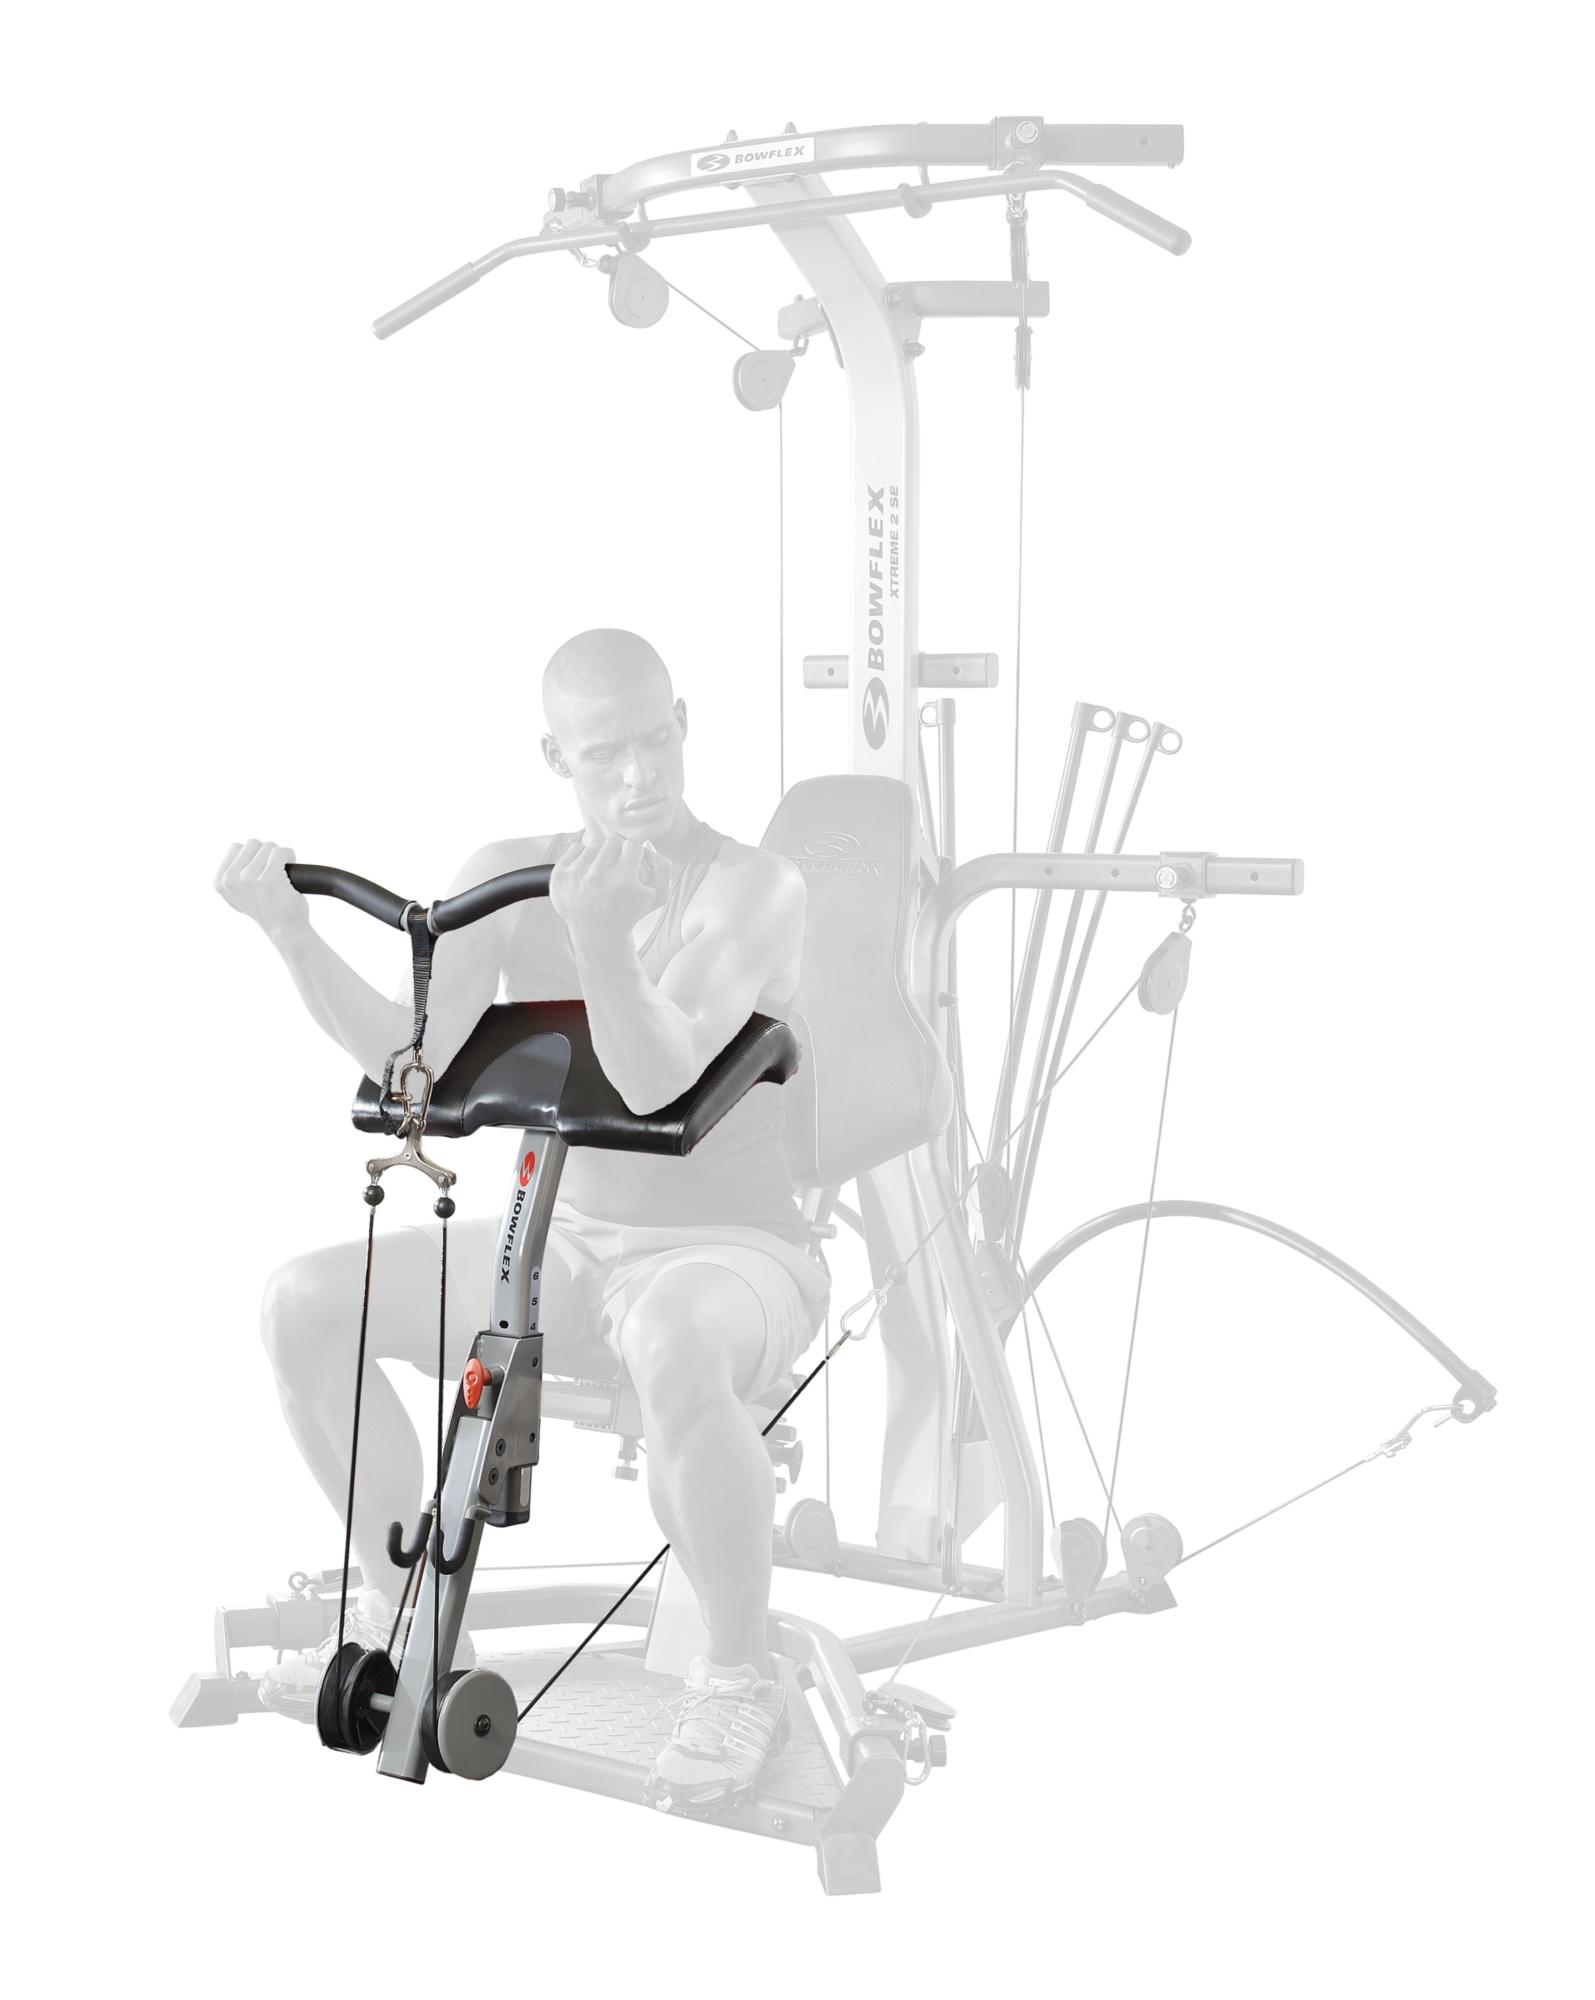 Bowflex Fitness Equipment For Sale Online